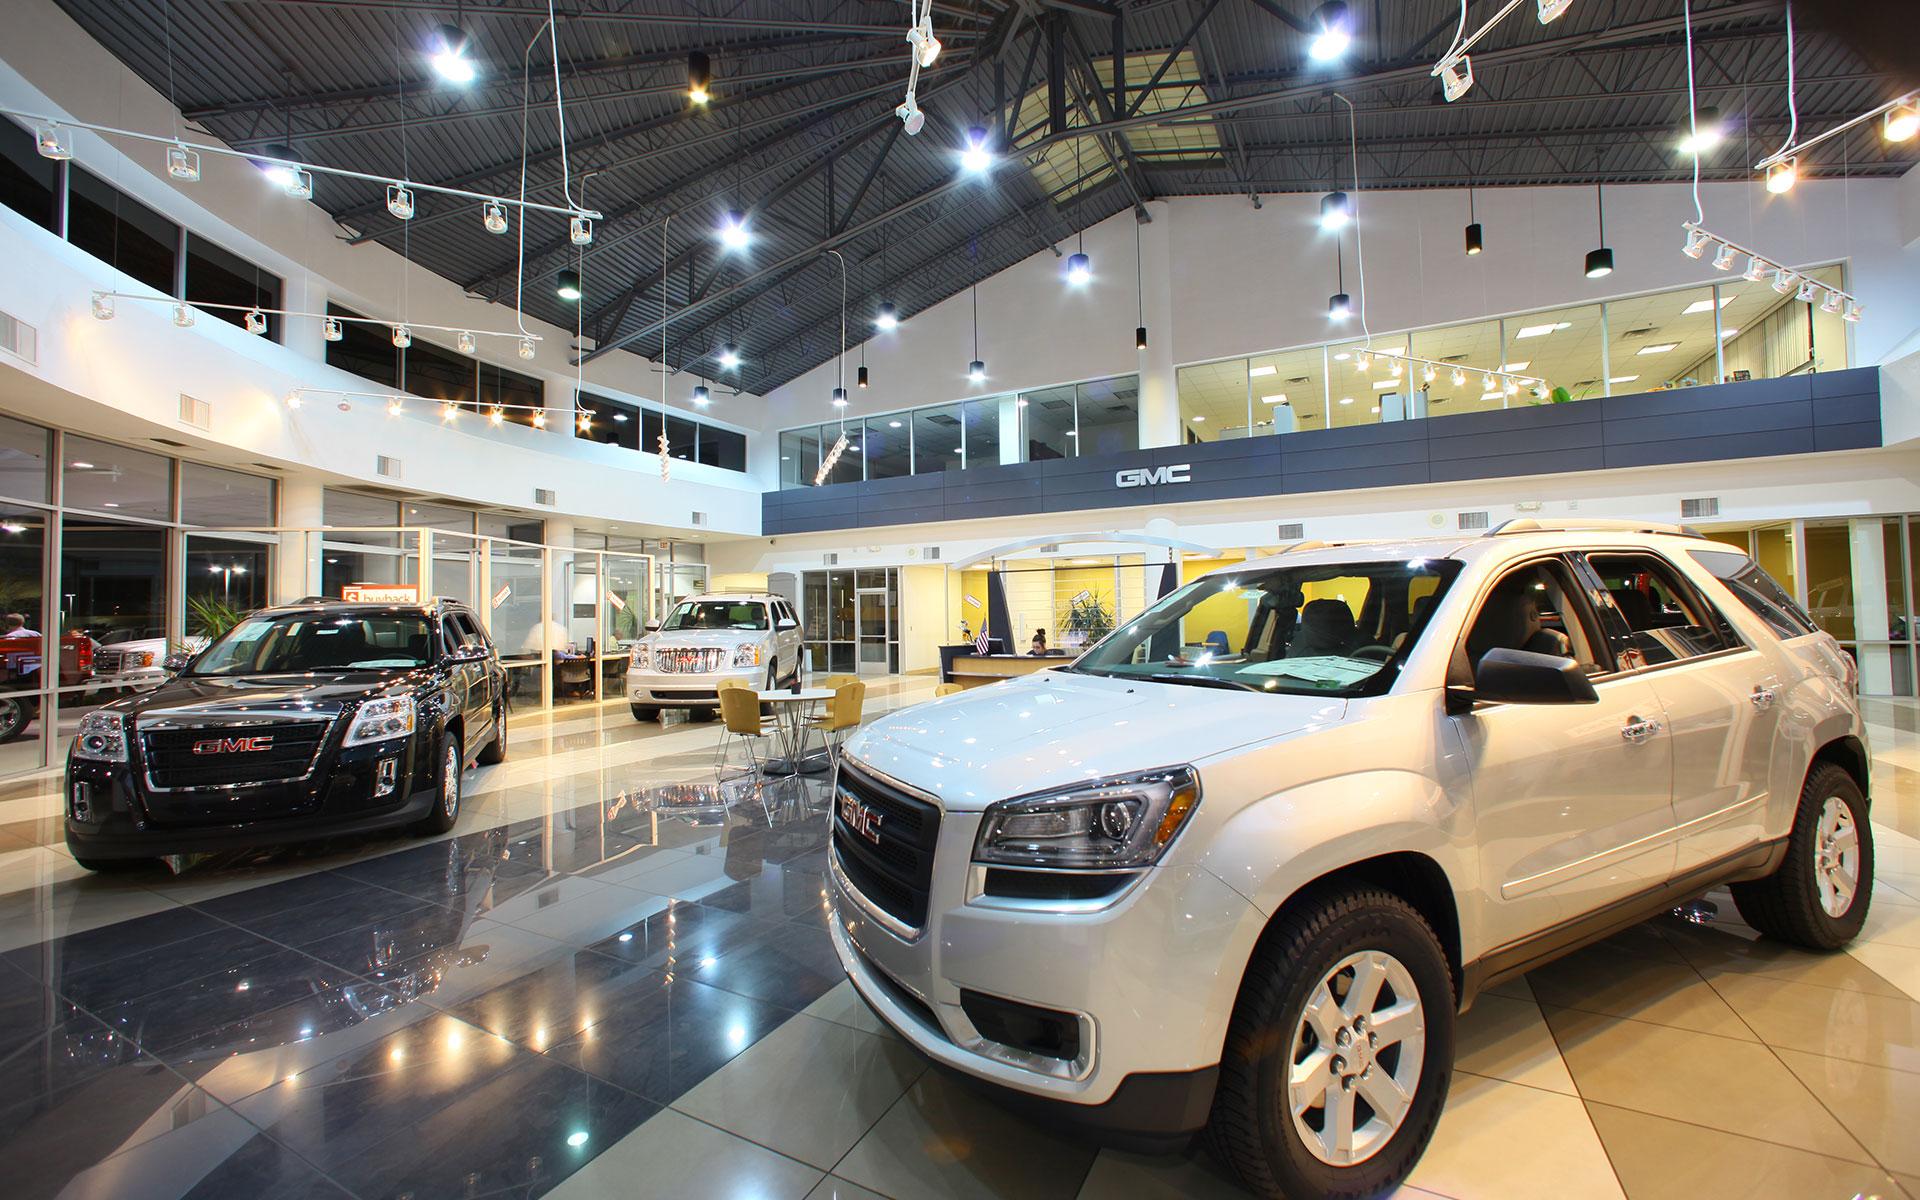 Liberty GMC: Interior